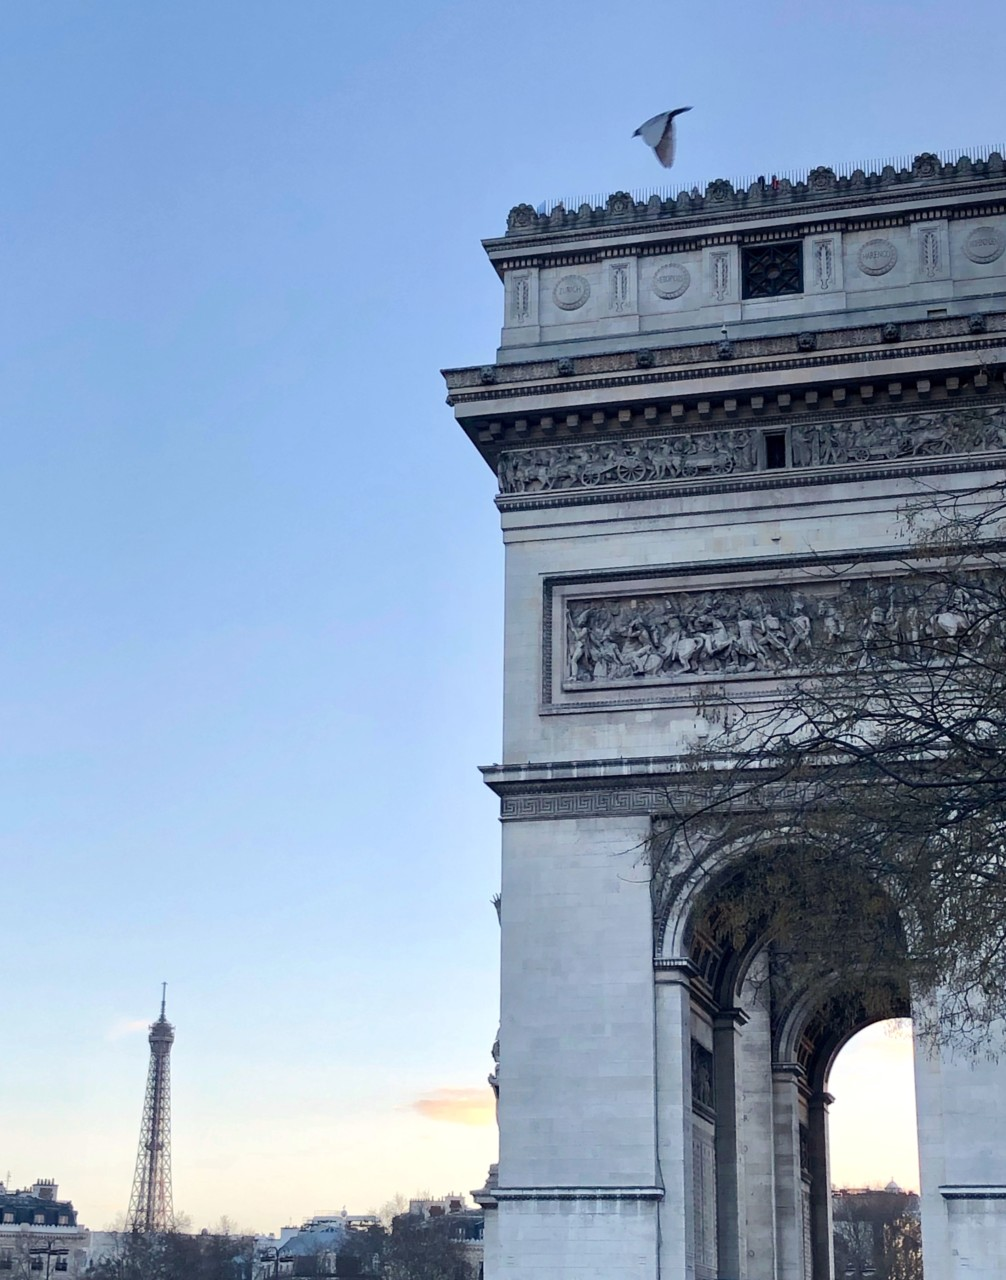 triumfbuen-paris-hidden-hotel